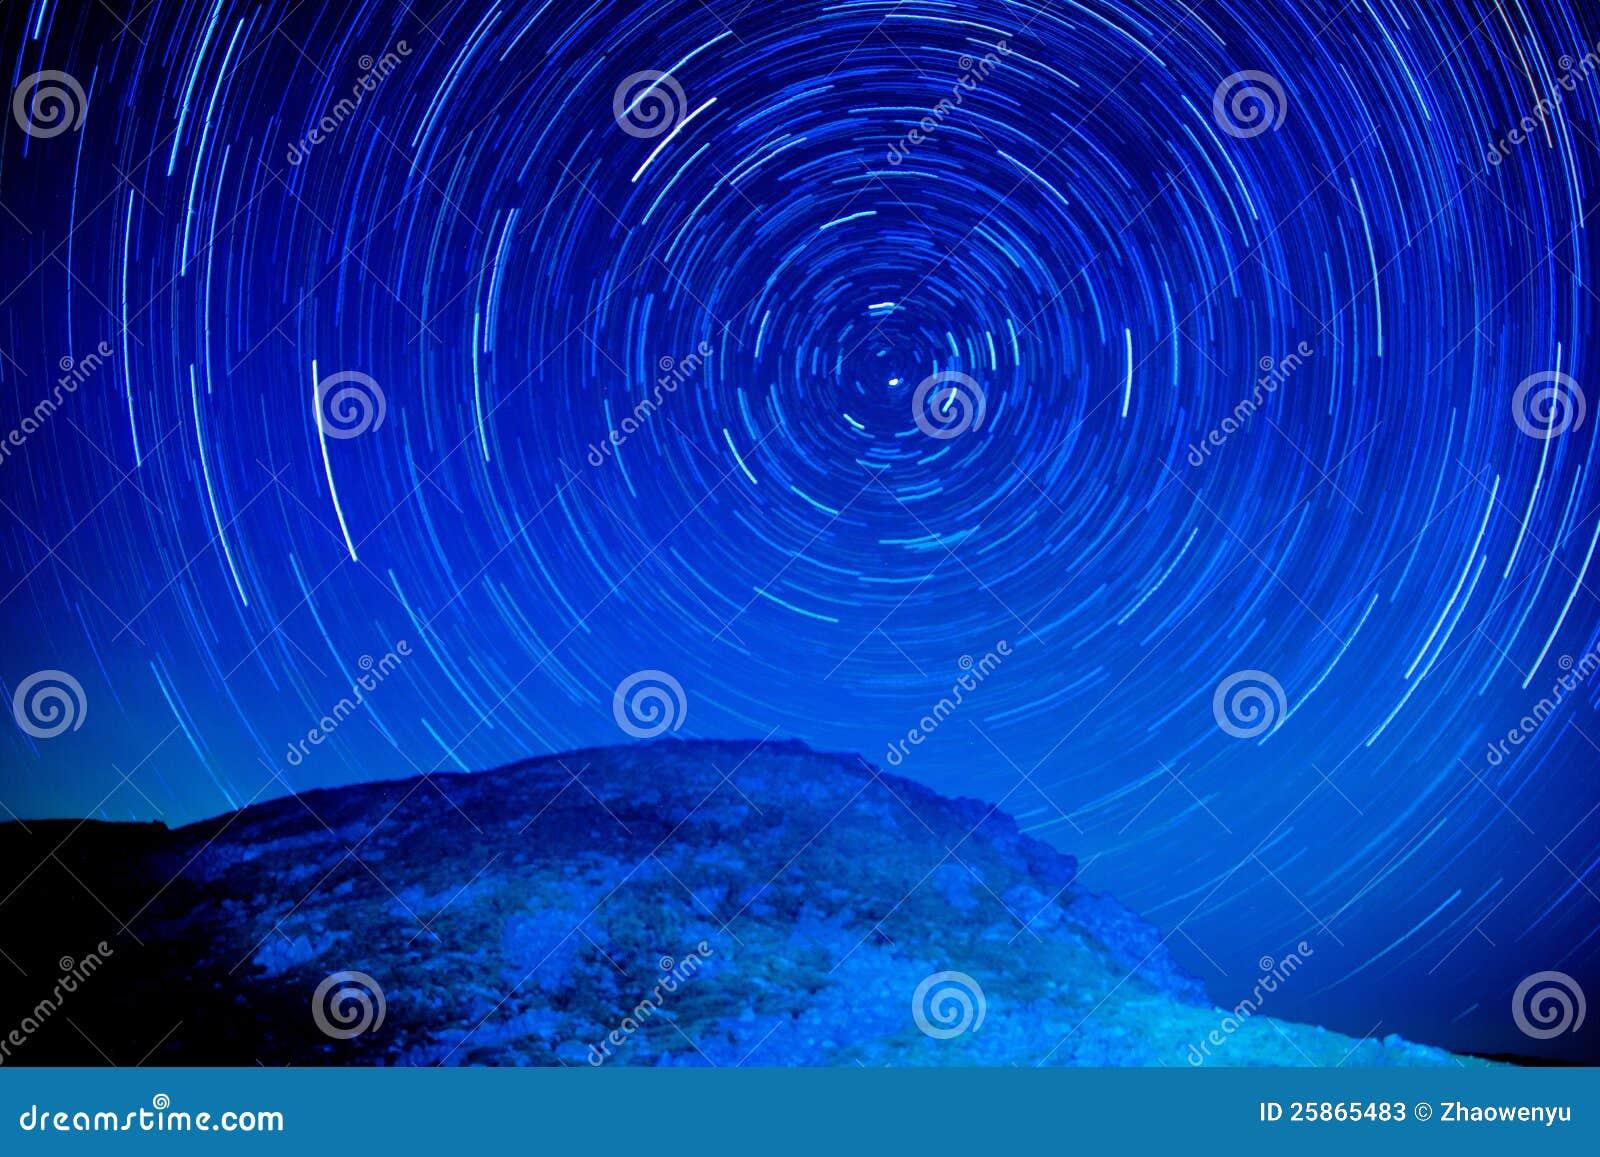 The Star Orbit of High Mountain